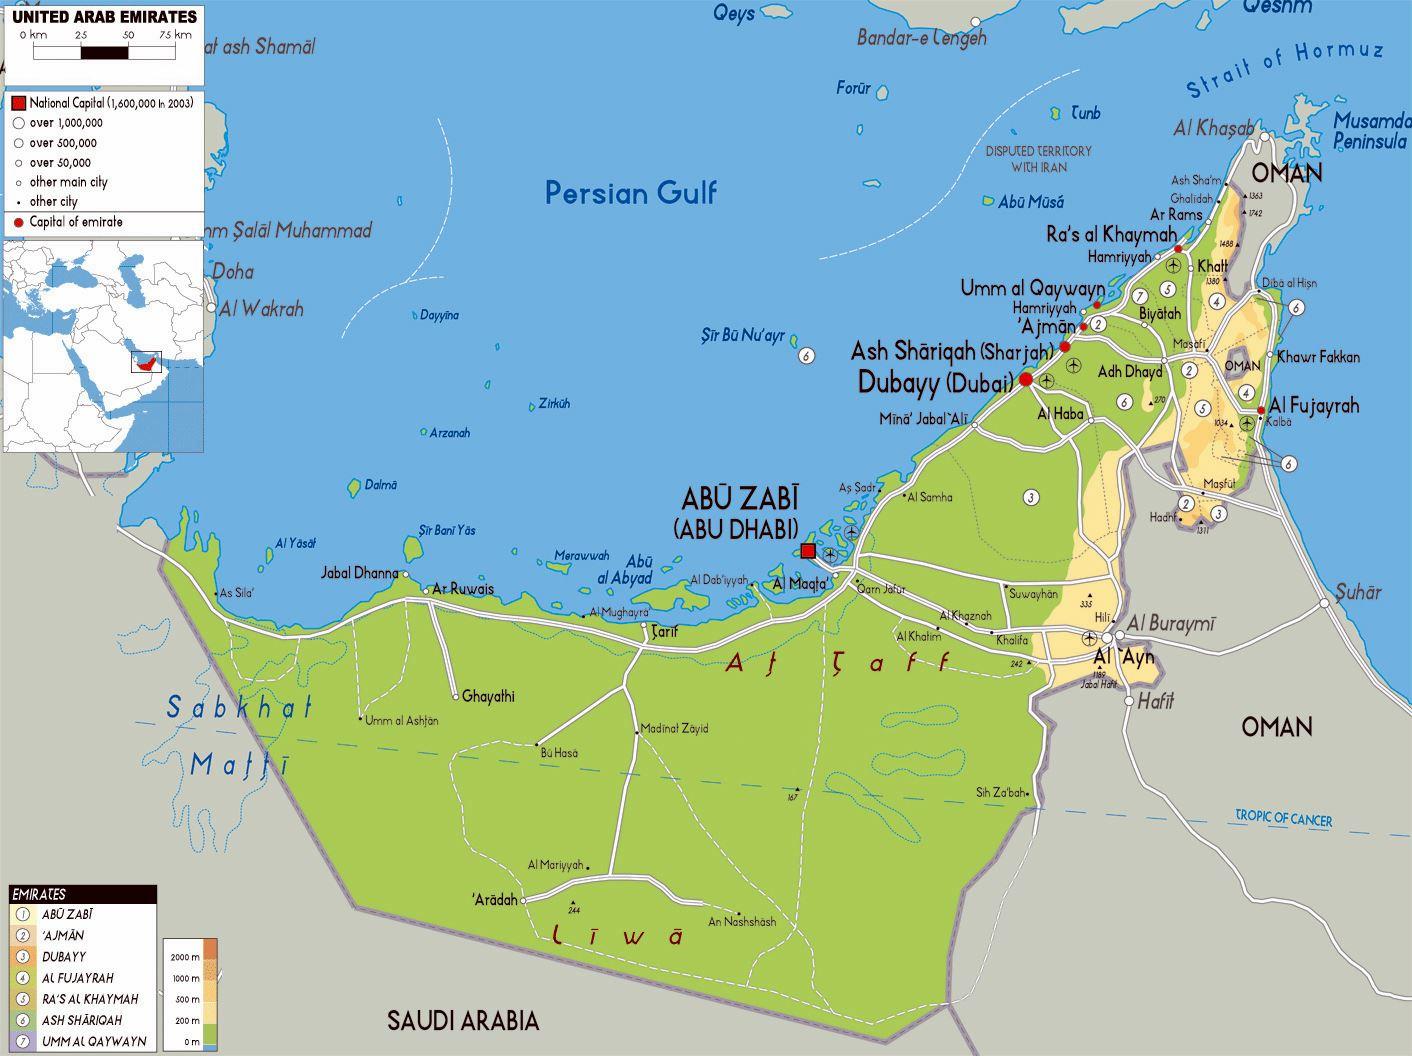 Abu Dhabi Map Large Abu Dhabi Region Maps for Free Download and Print | High  Abu Dhabi Map